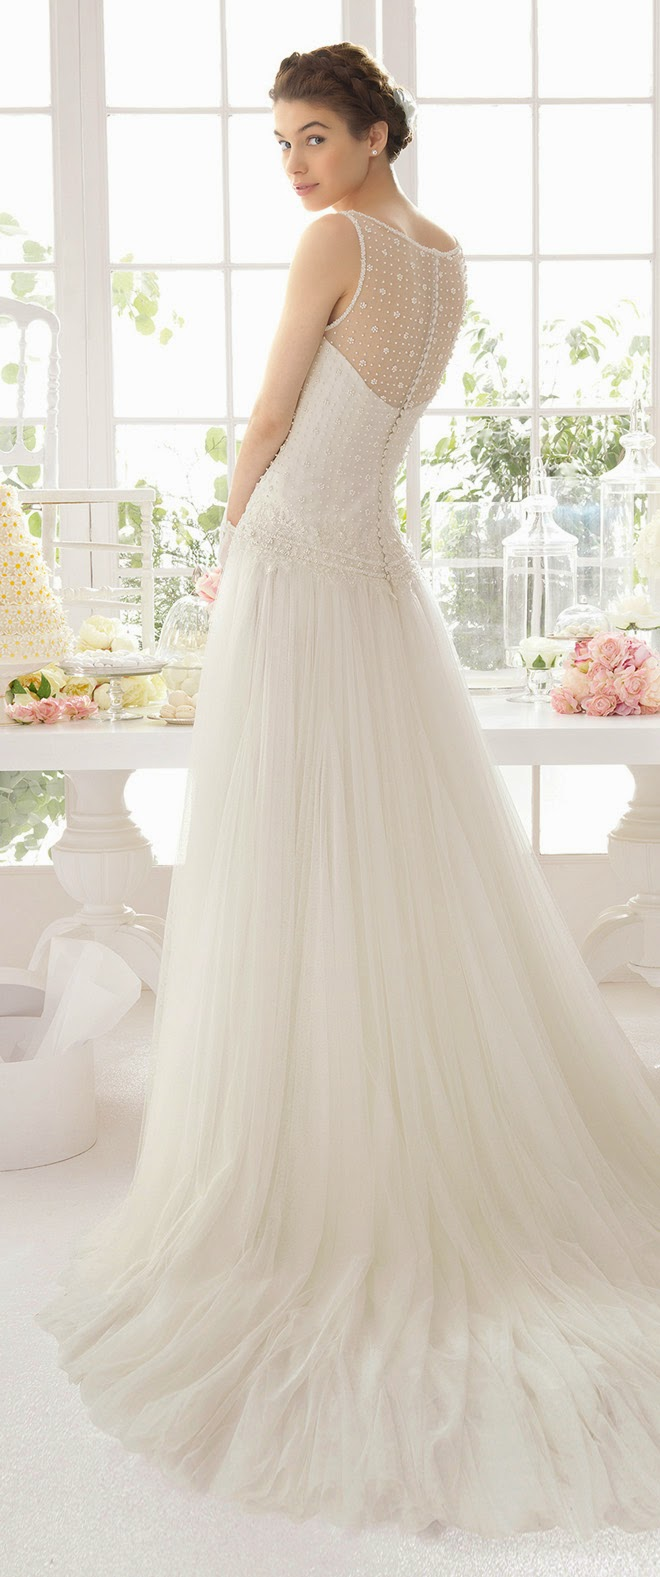 Fifties Wedding Dresses 69 Fancy Please contact Aire Barcelona